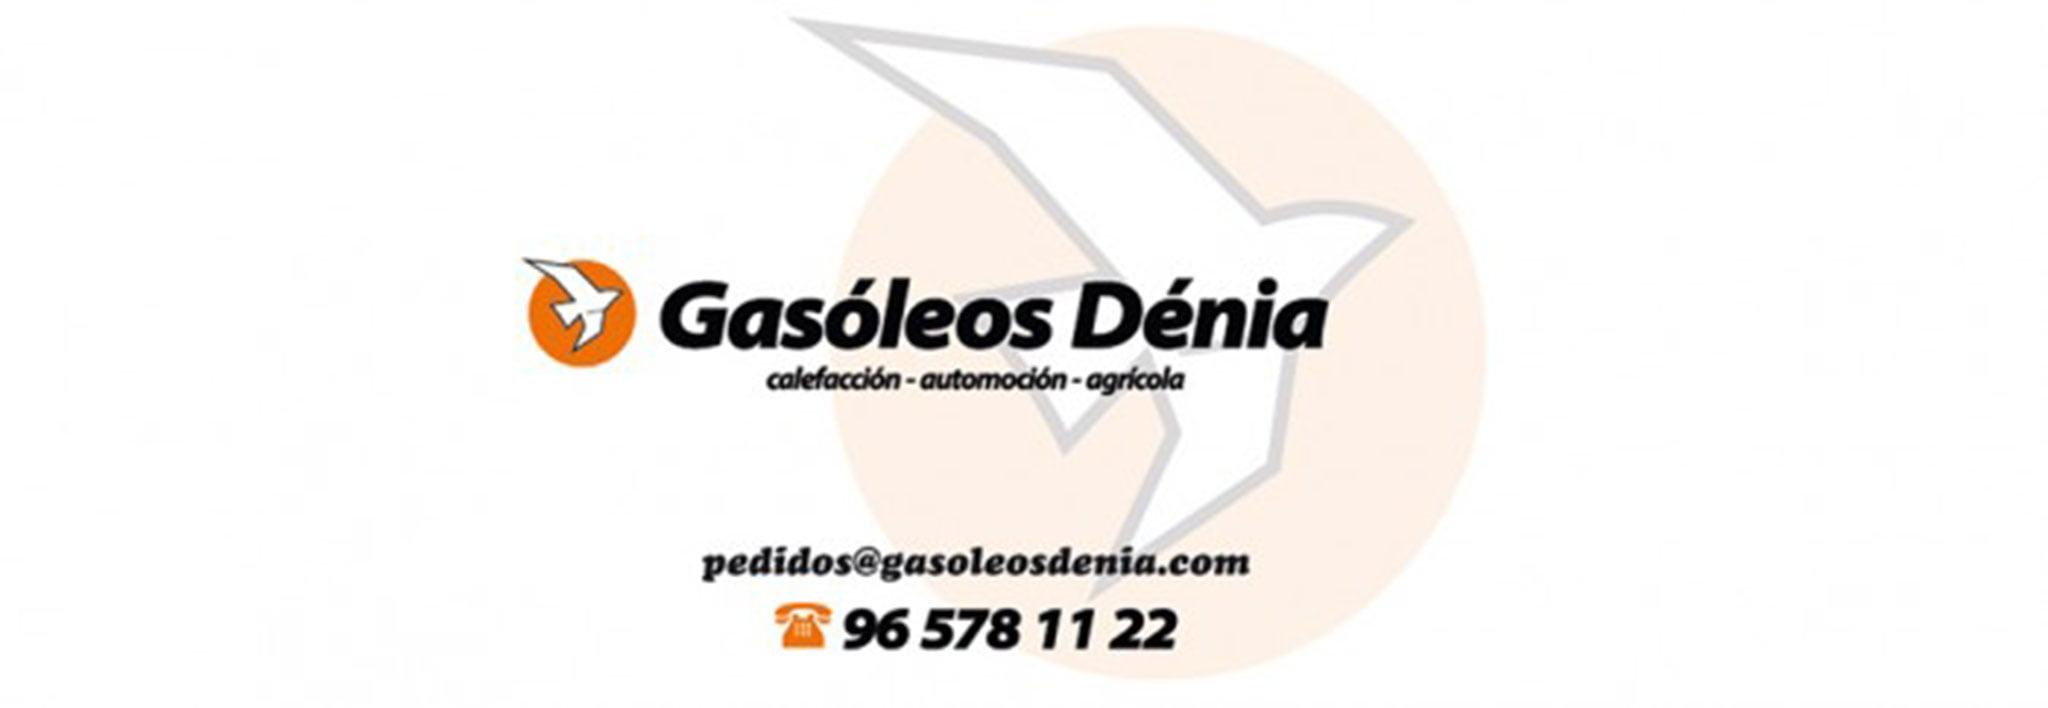 Logotip de Gasoils Dénia